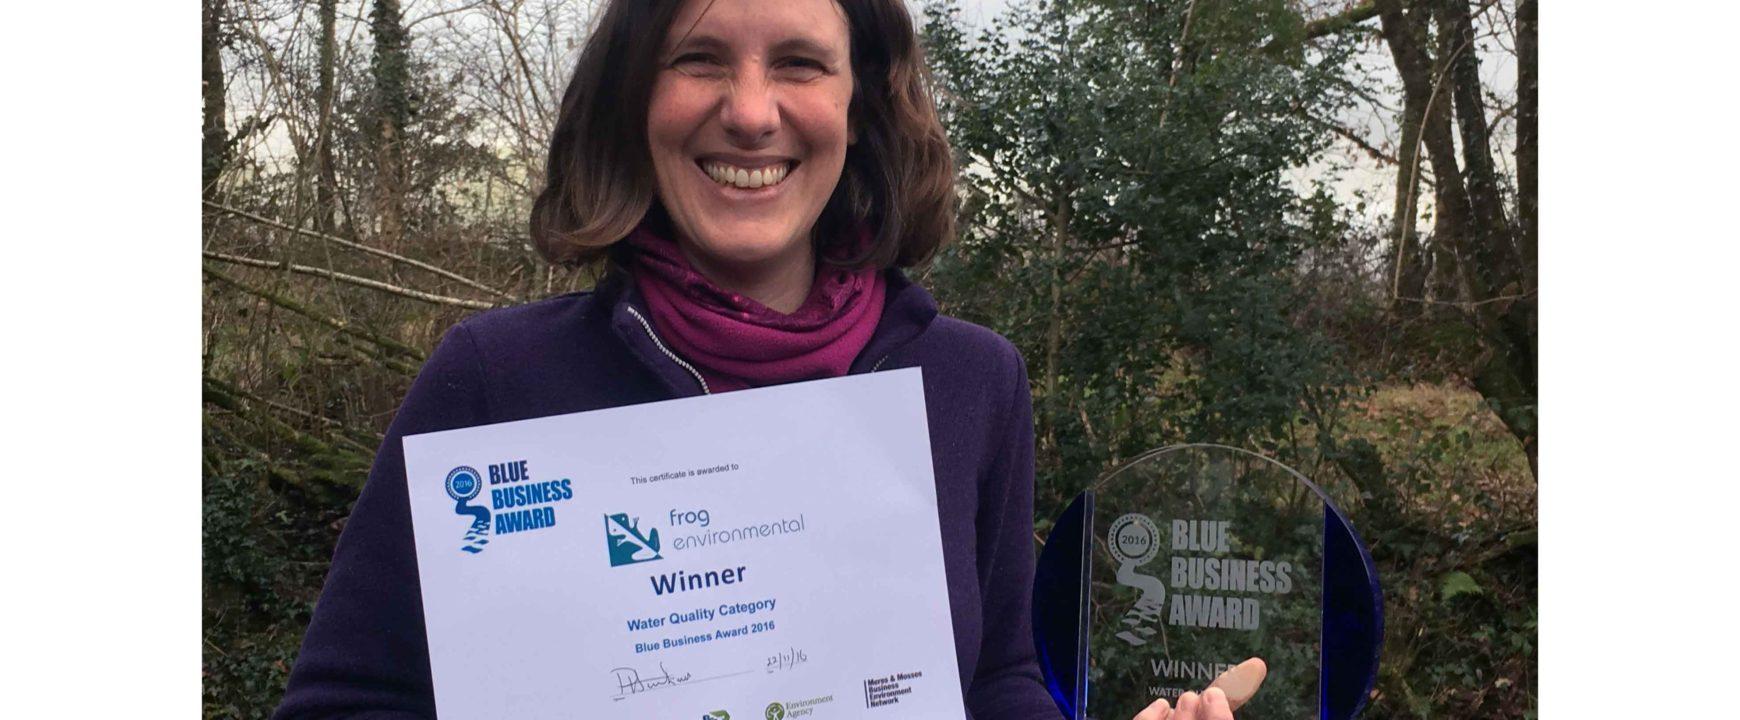 Leela-O'Dea-and-the-Blue-Business-Awards,-Shropshire-Wildlife-Trust